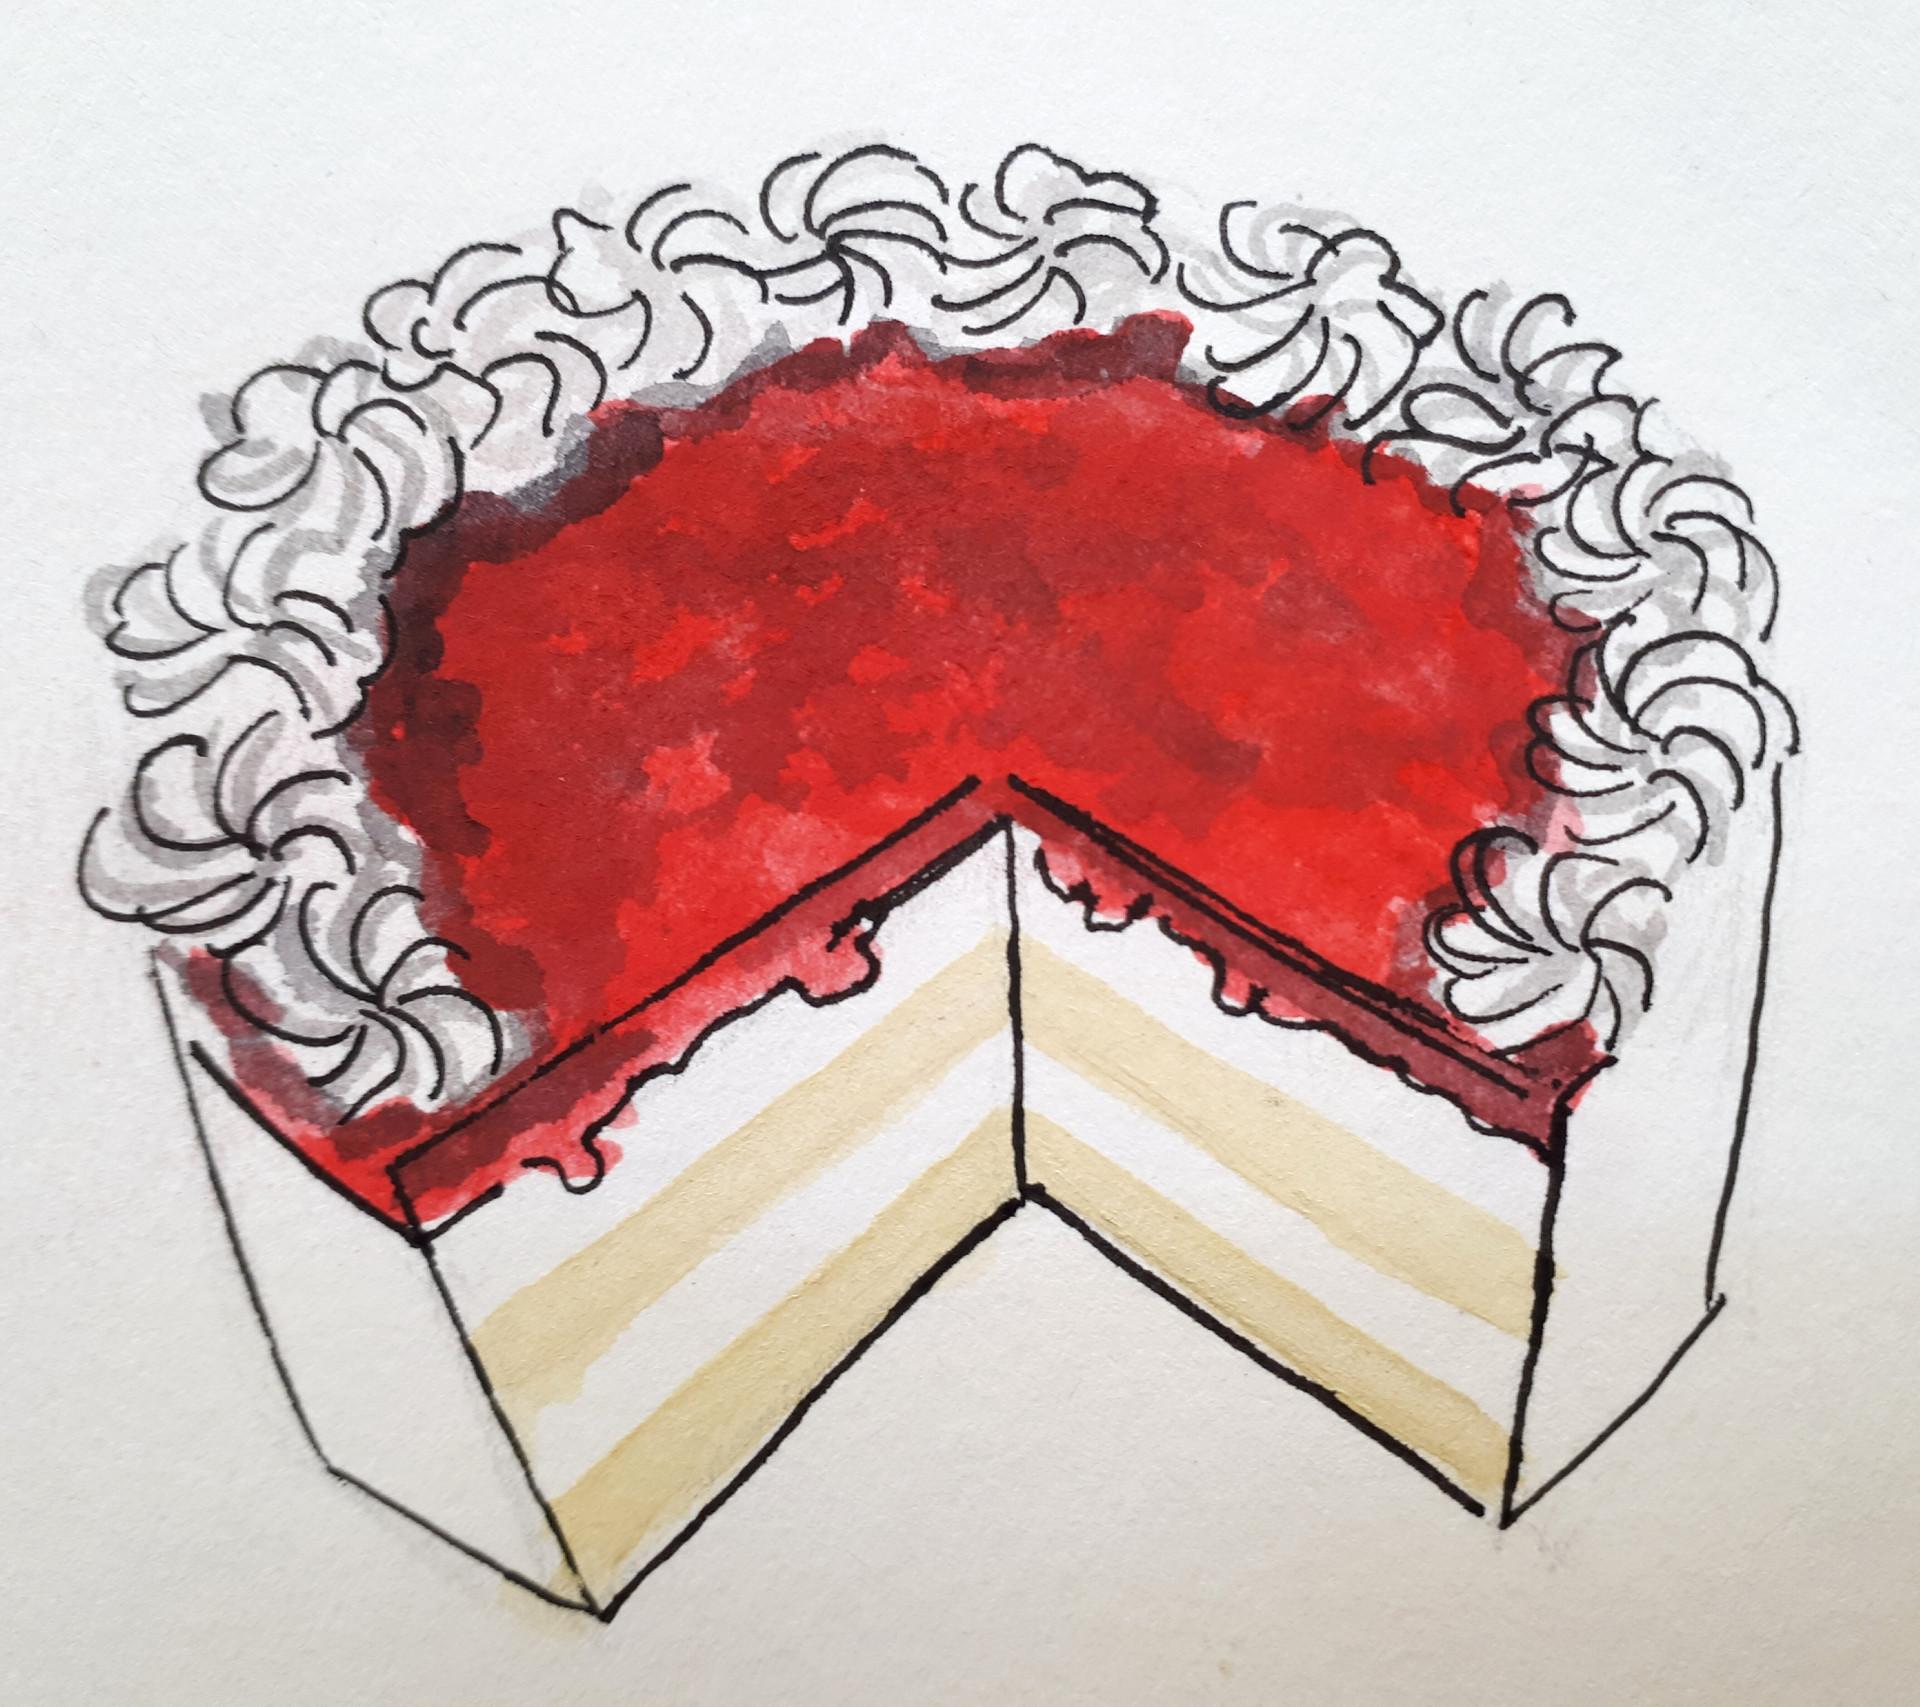 'A Cake', 2017.